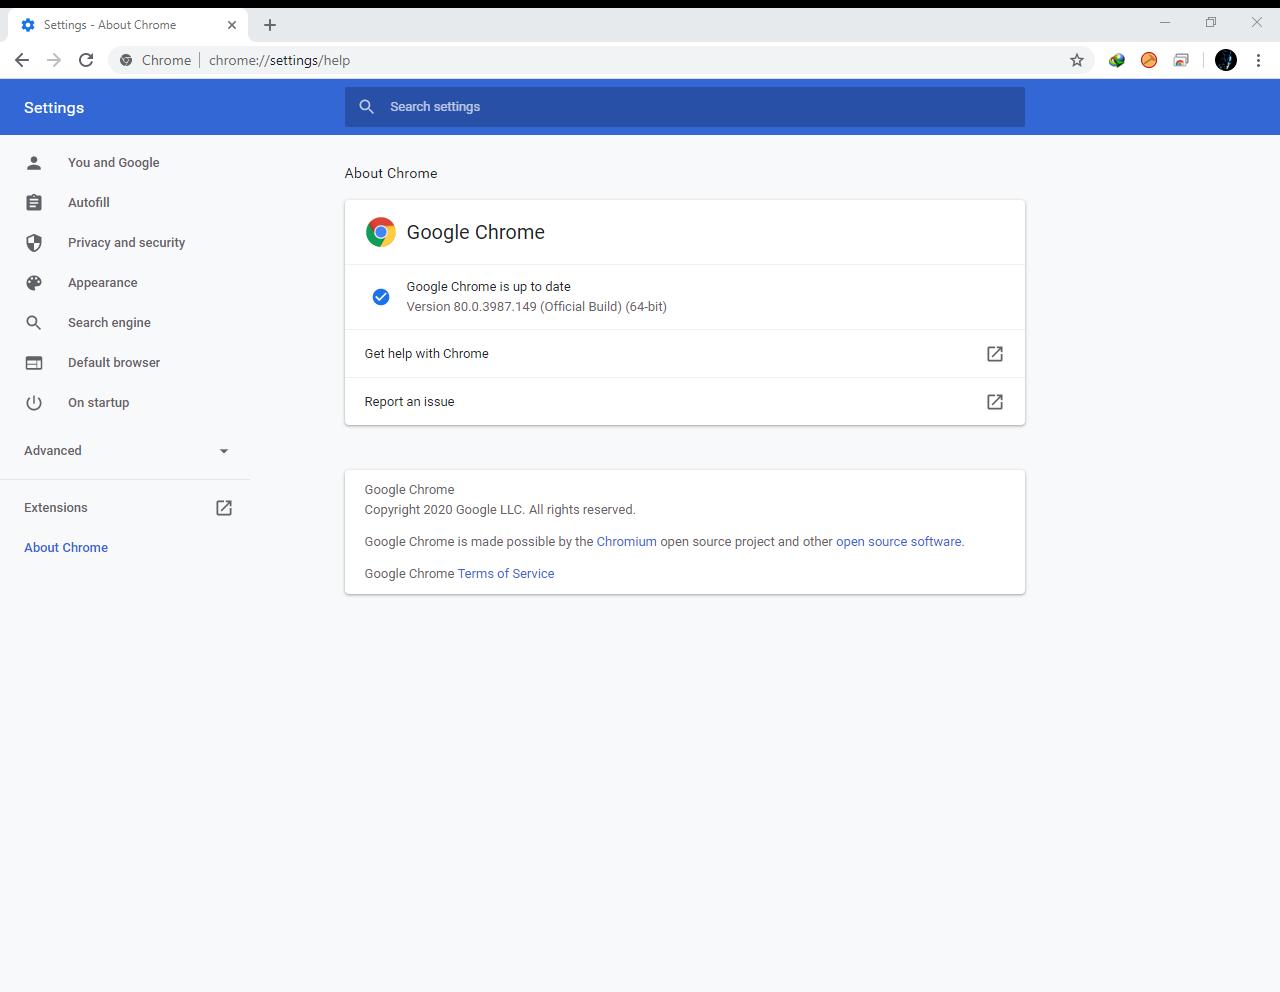 Google Chrome Browser 80.0.3987.149